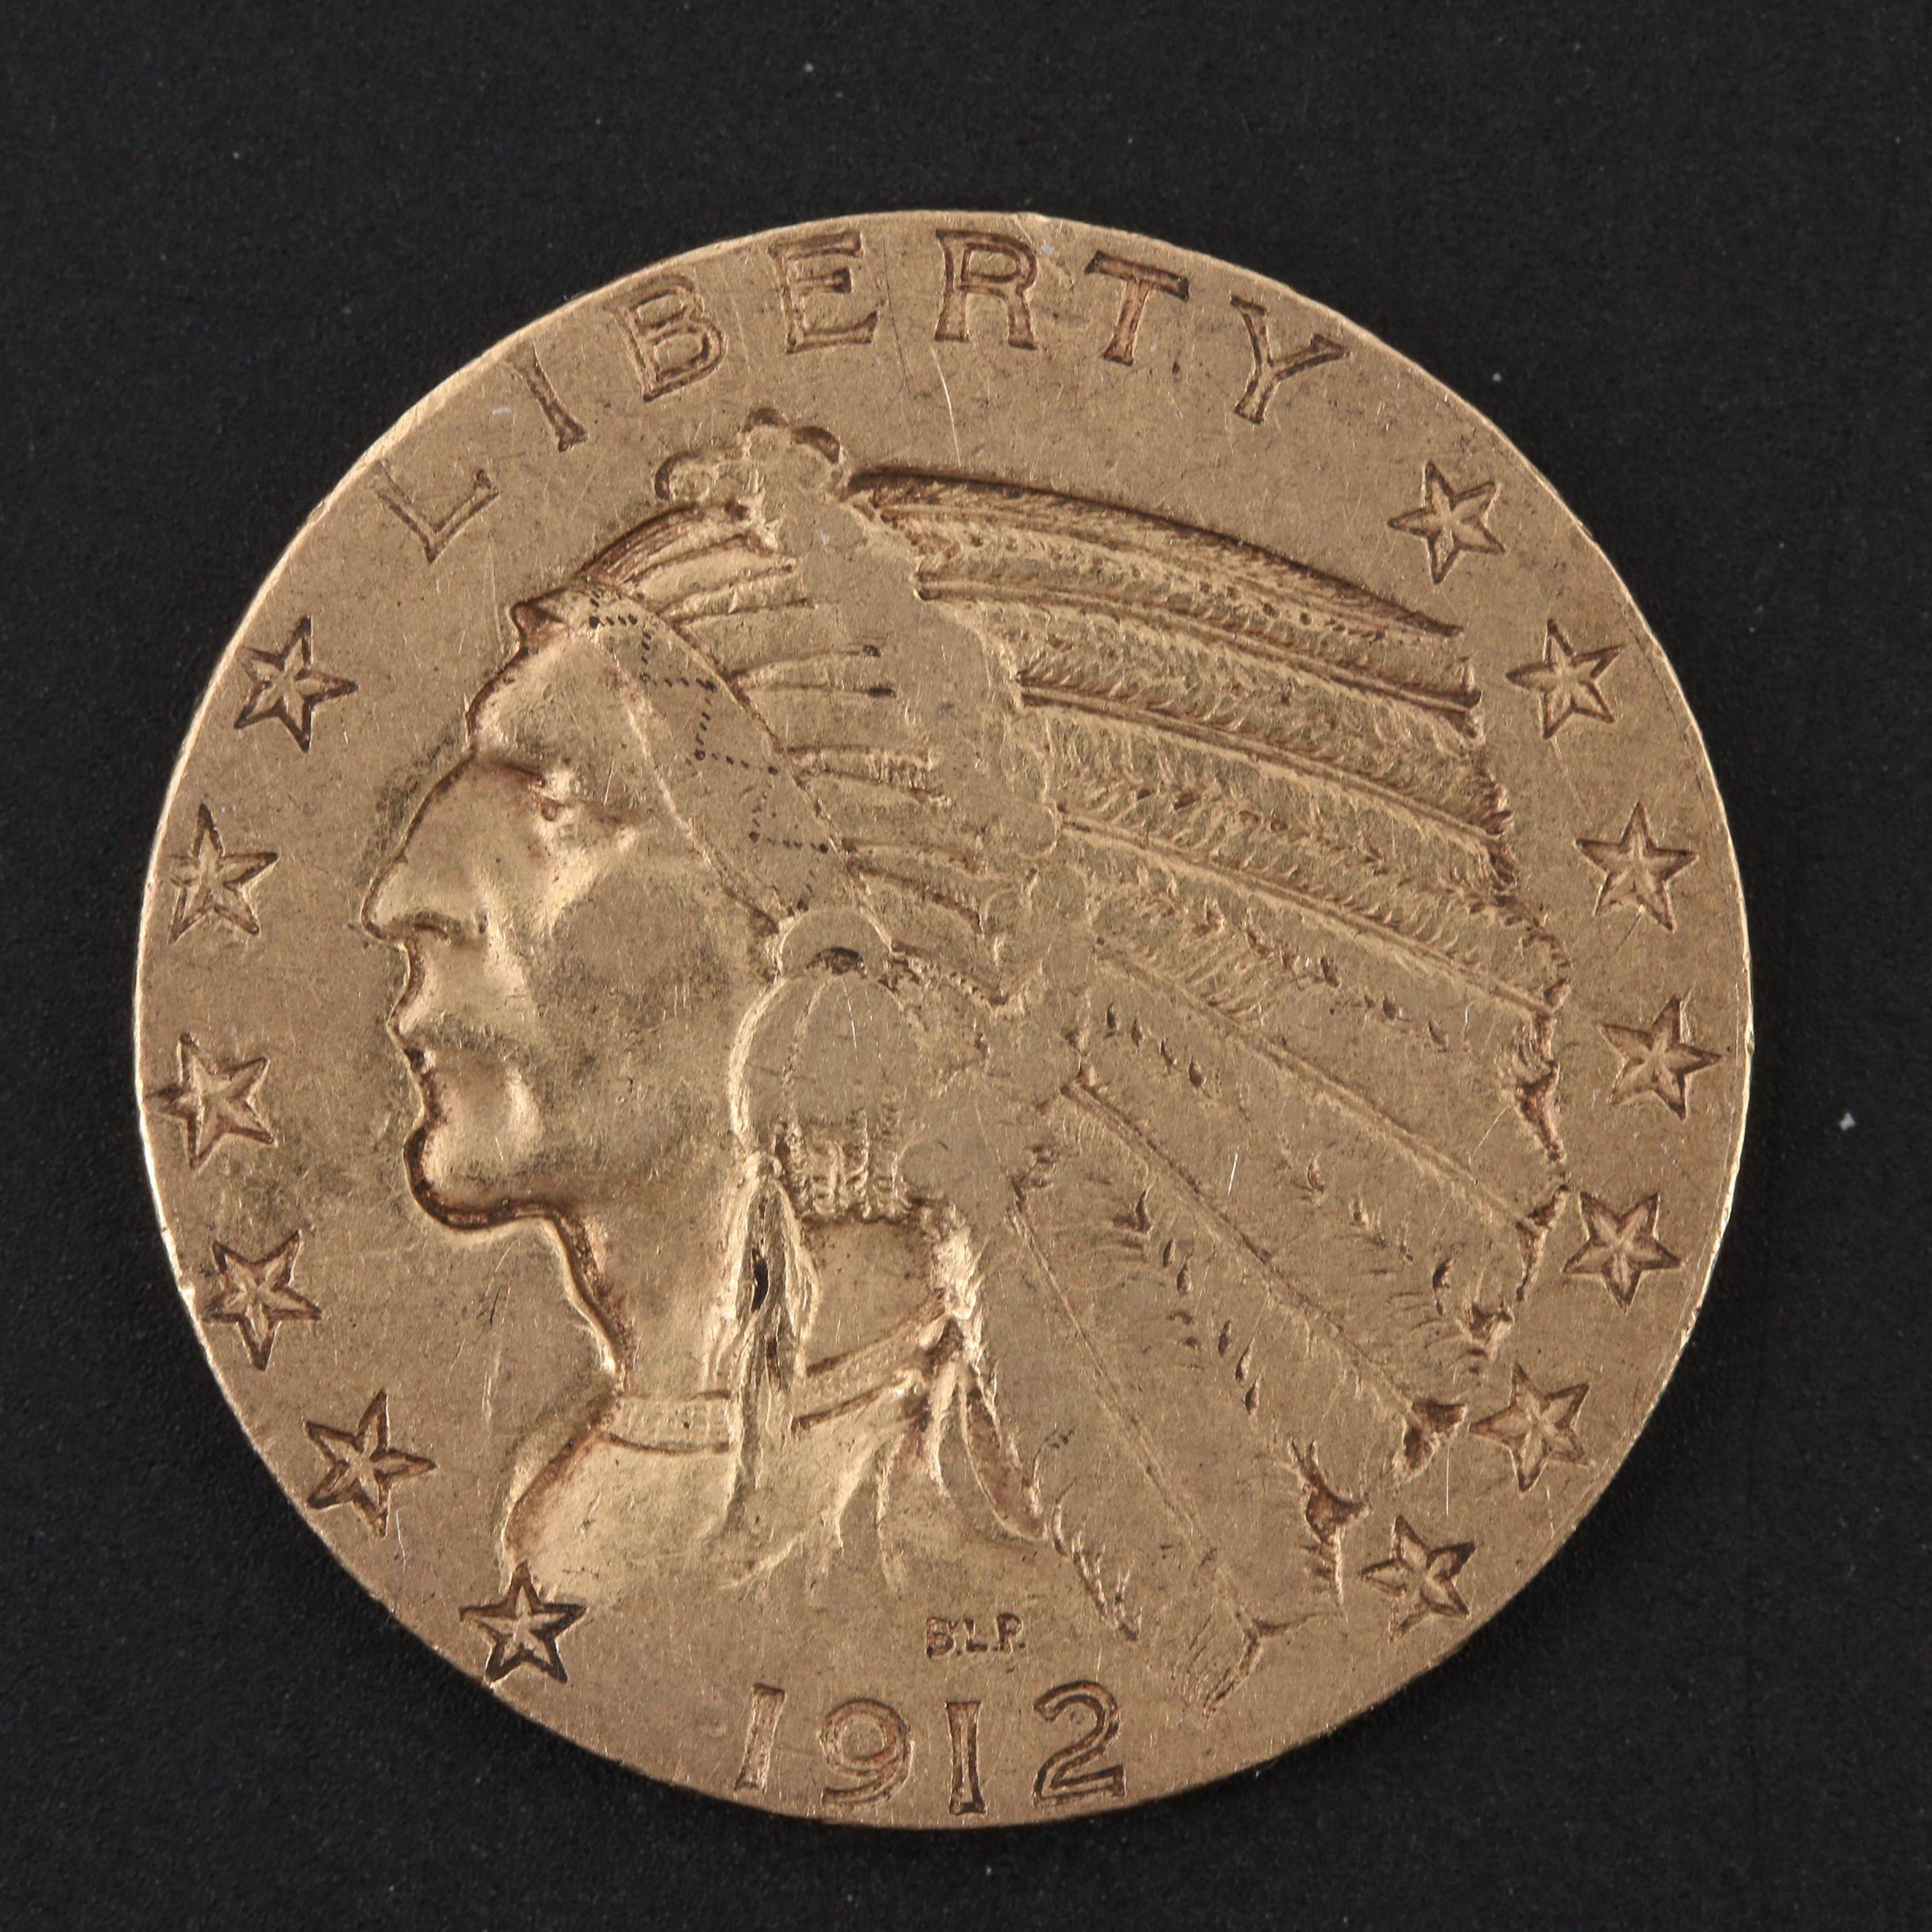 1912-S Indian Head $5 Half Eagle Gold Coin